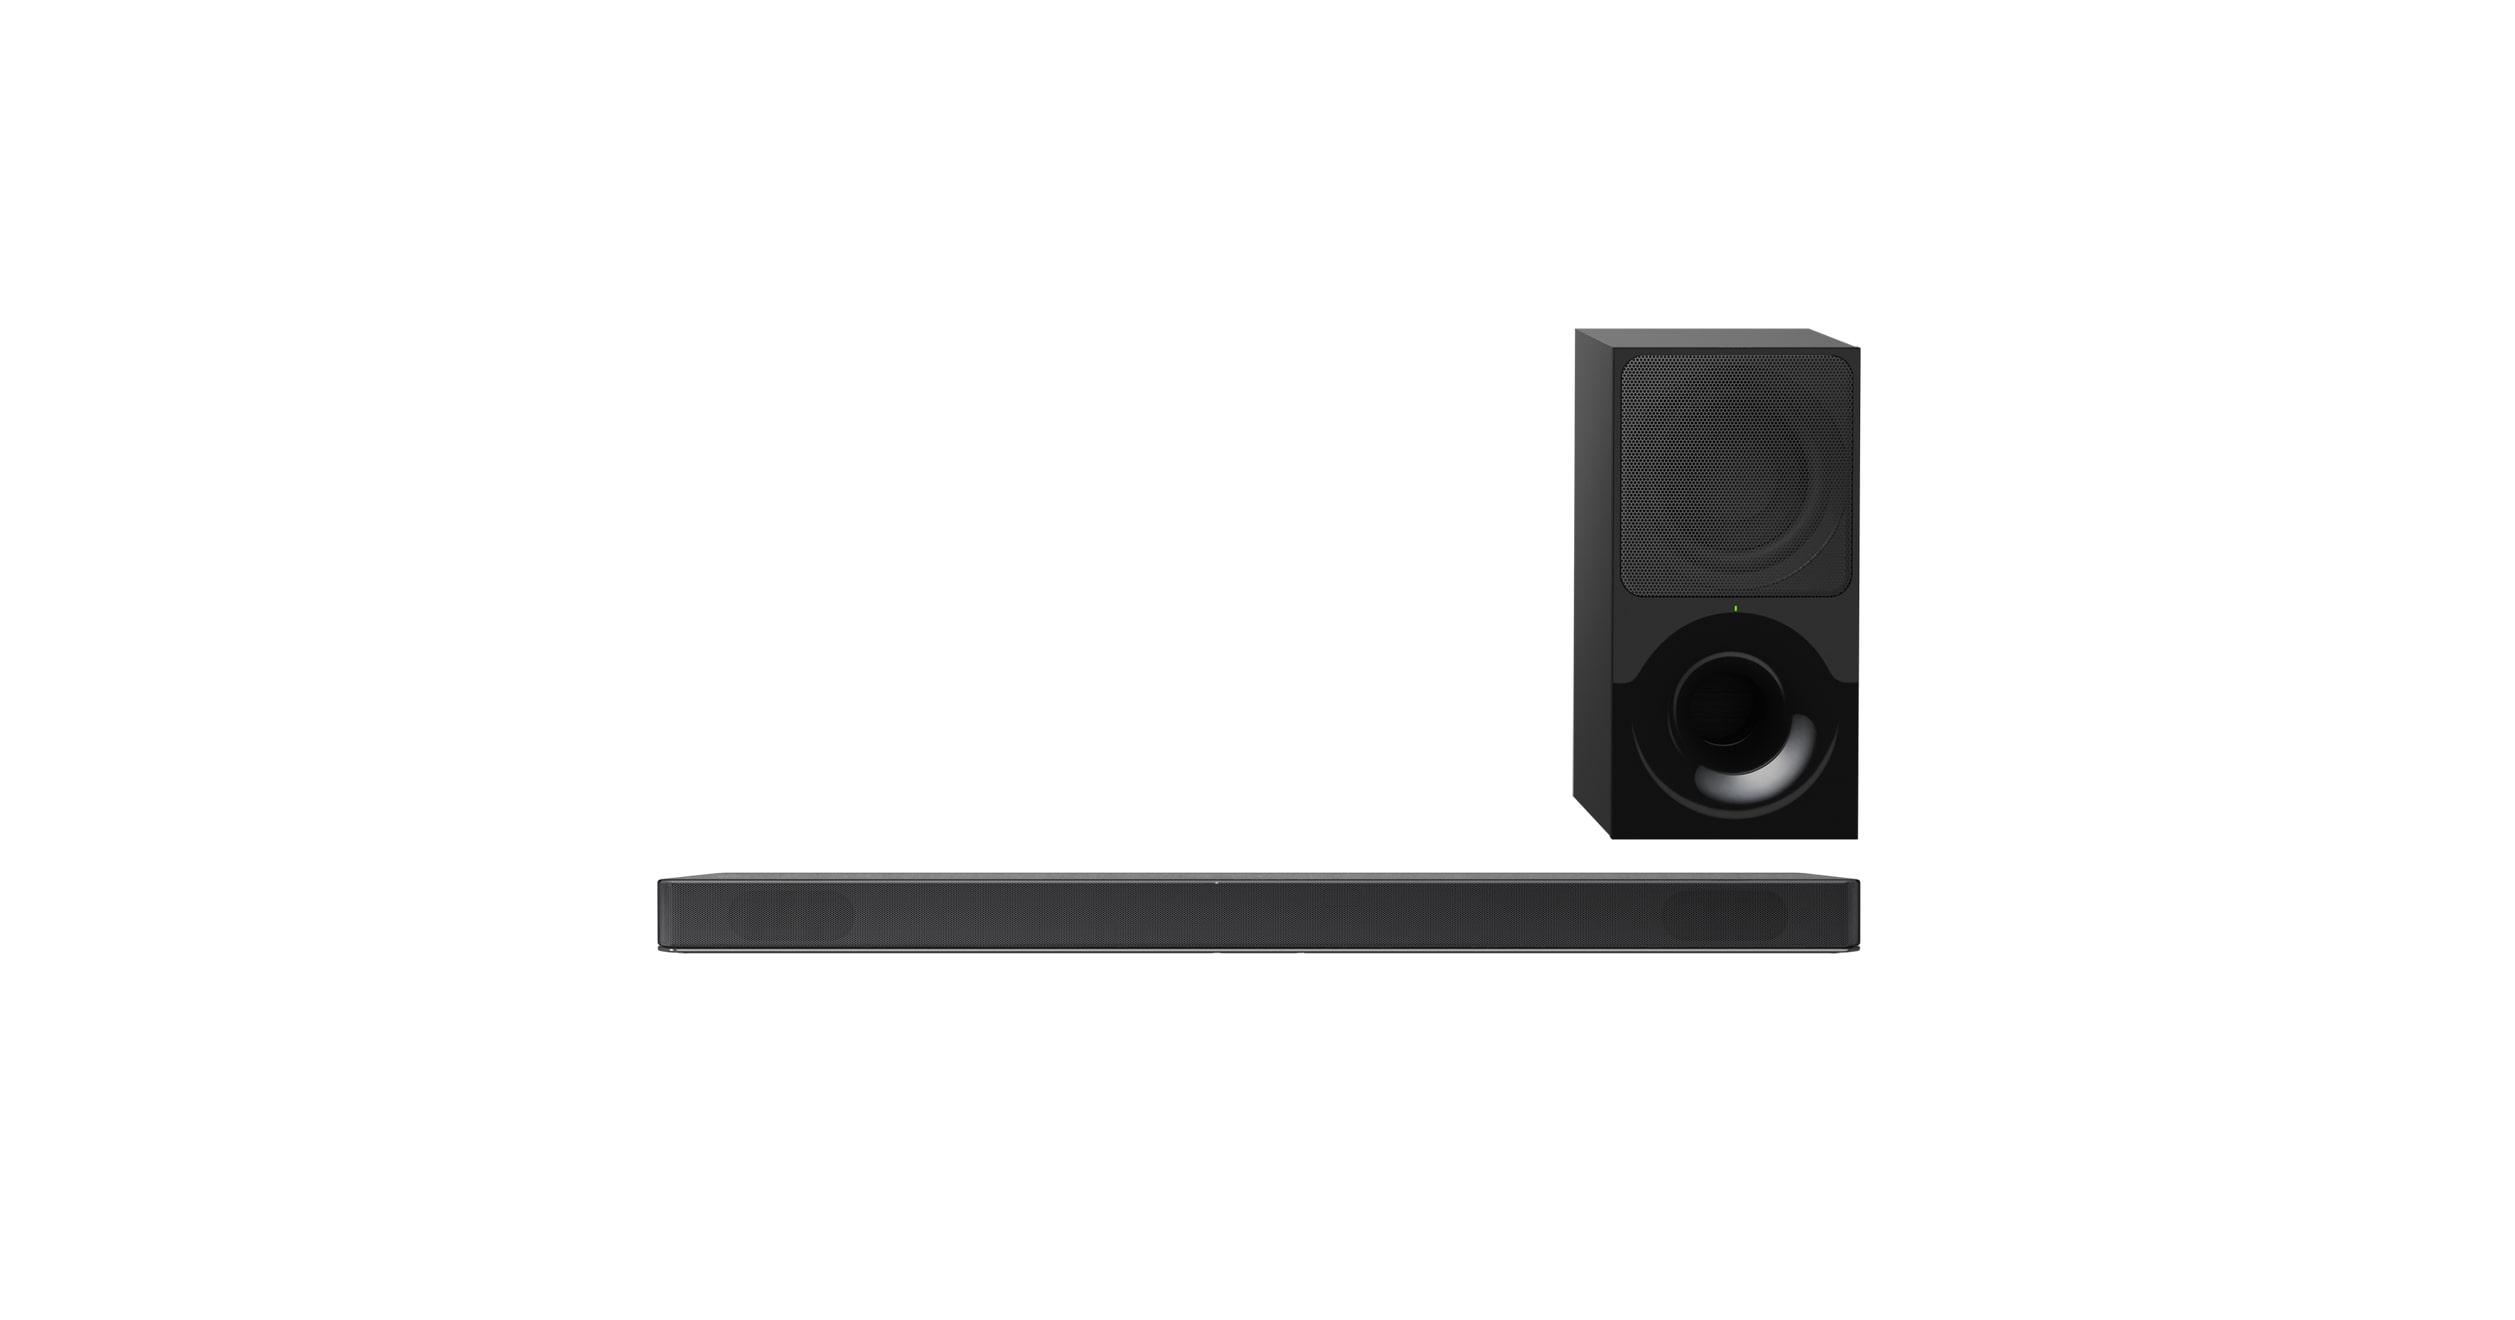 caract ristiques techniques du ht xf9000 barres de son sony be. Black Bedroom Furniture Sets. Home Design Ideas